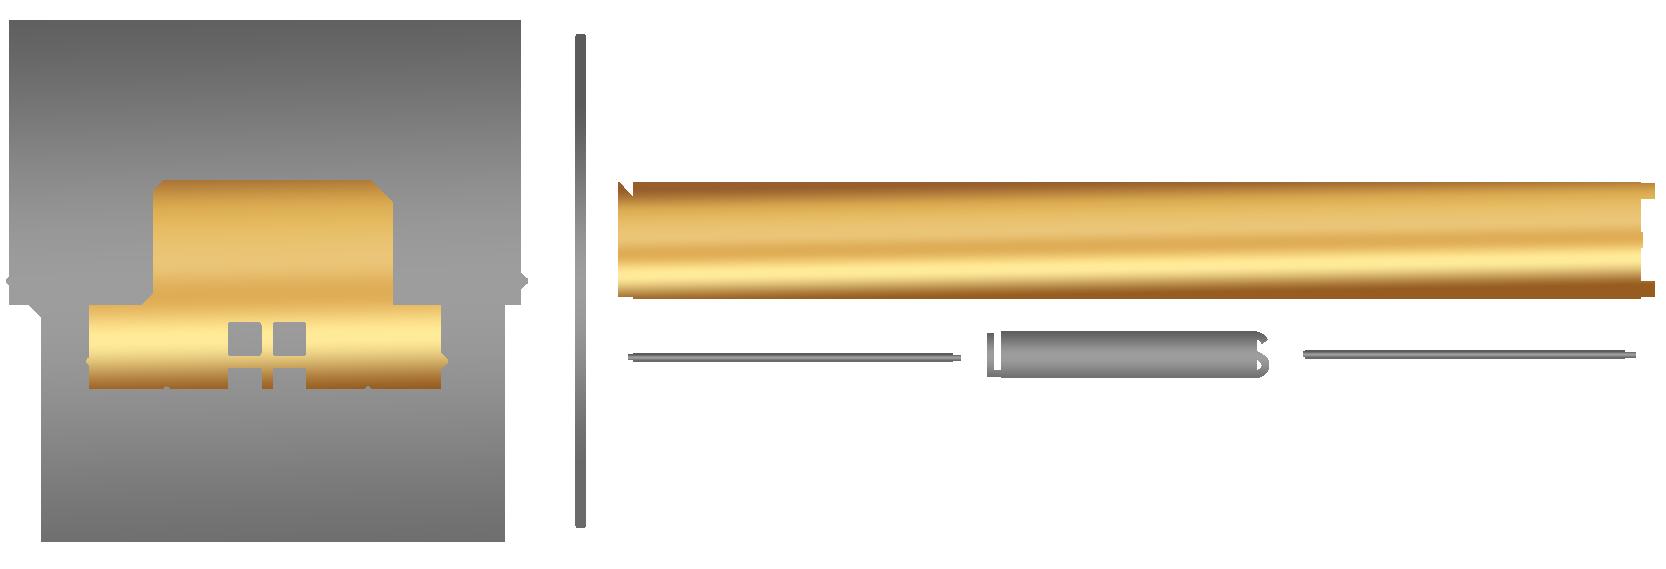 National One Loans, Inc.